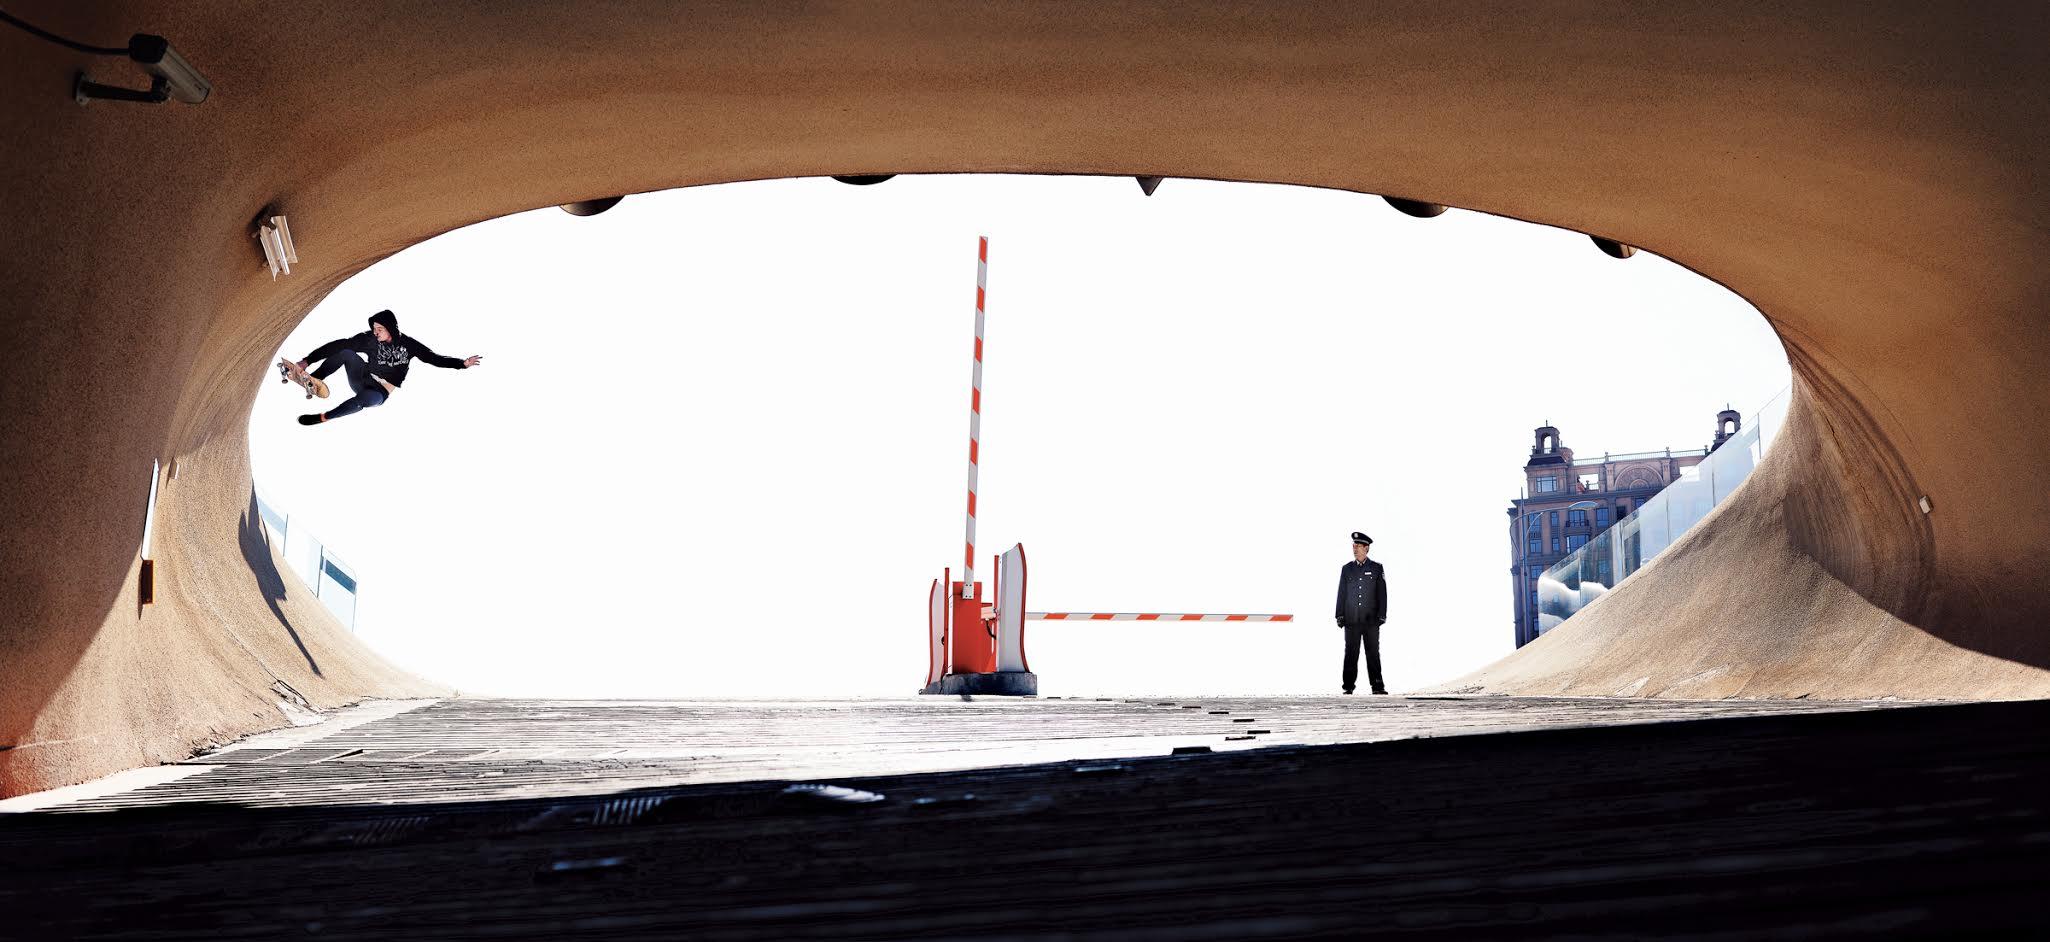 PAUL BATTLAY ~ ORDOS, CHINA Trick:Boneless.Photo by Jake Darwen.